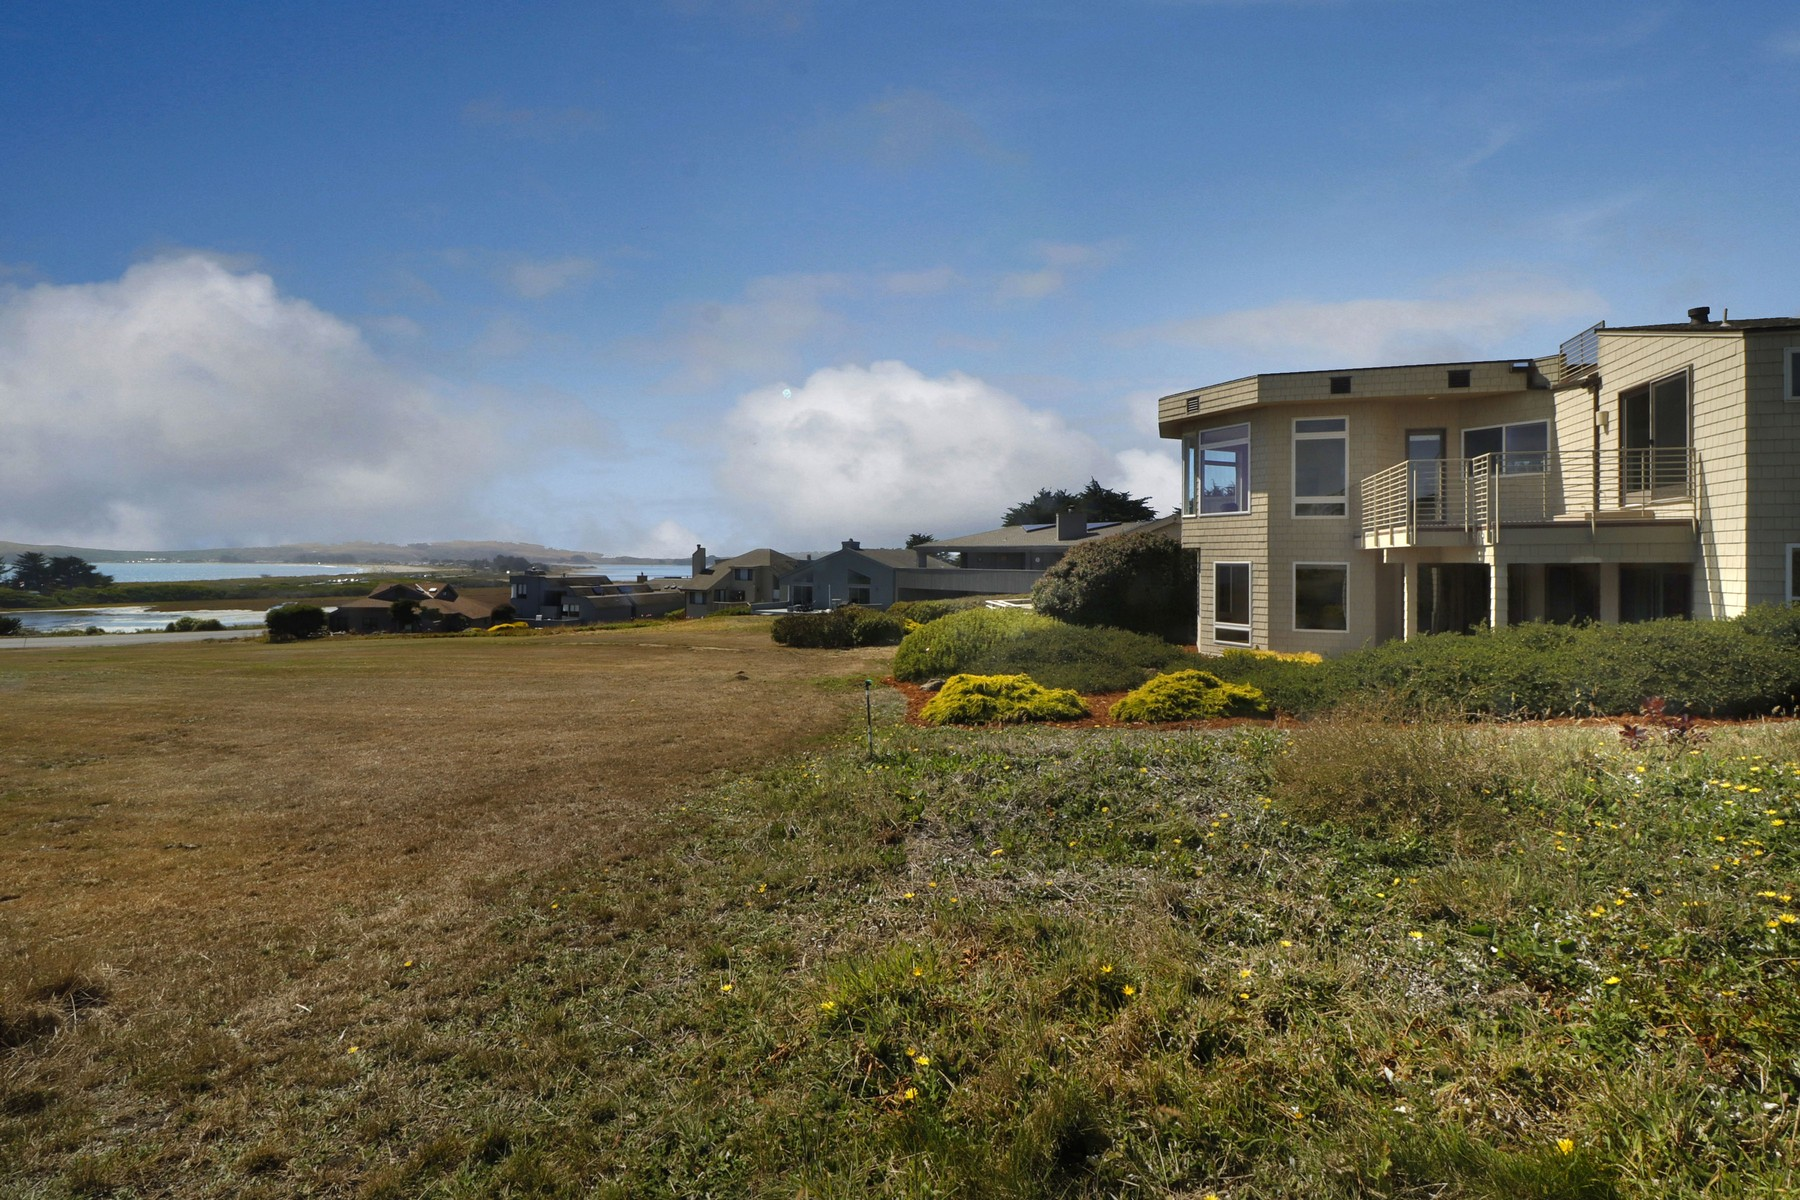 Single Family Homes for Sale at 21574 Heron Drive Bodega Bay, California 94923 United States